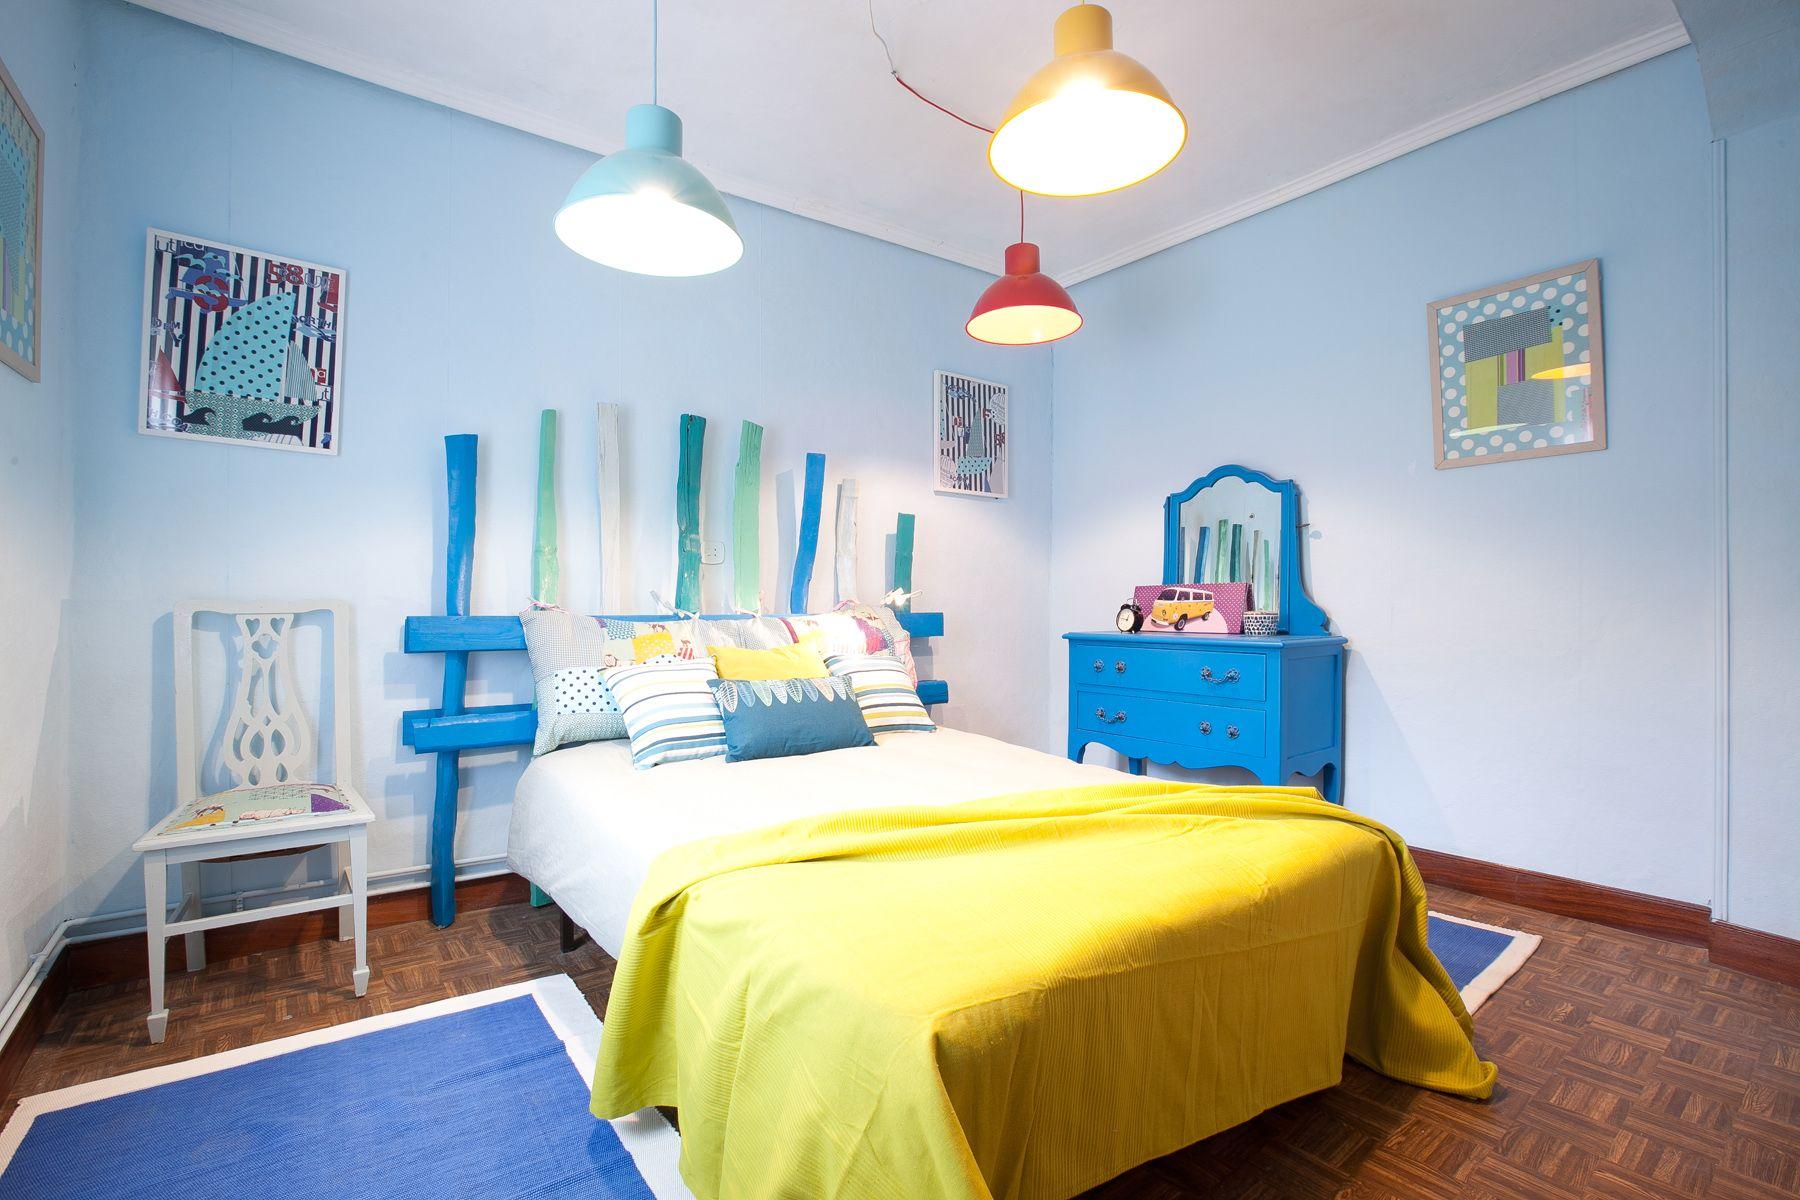 dormitorio fresco colorido